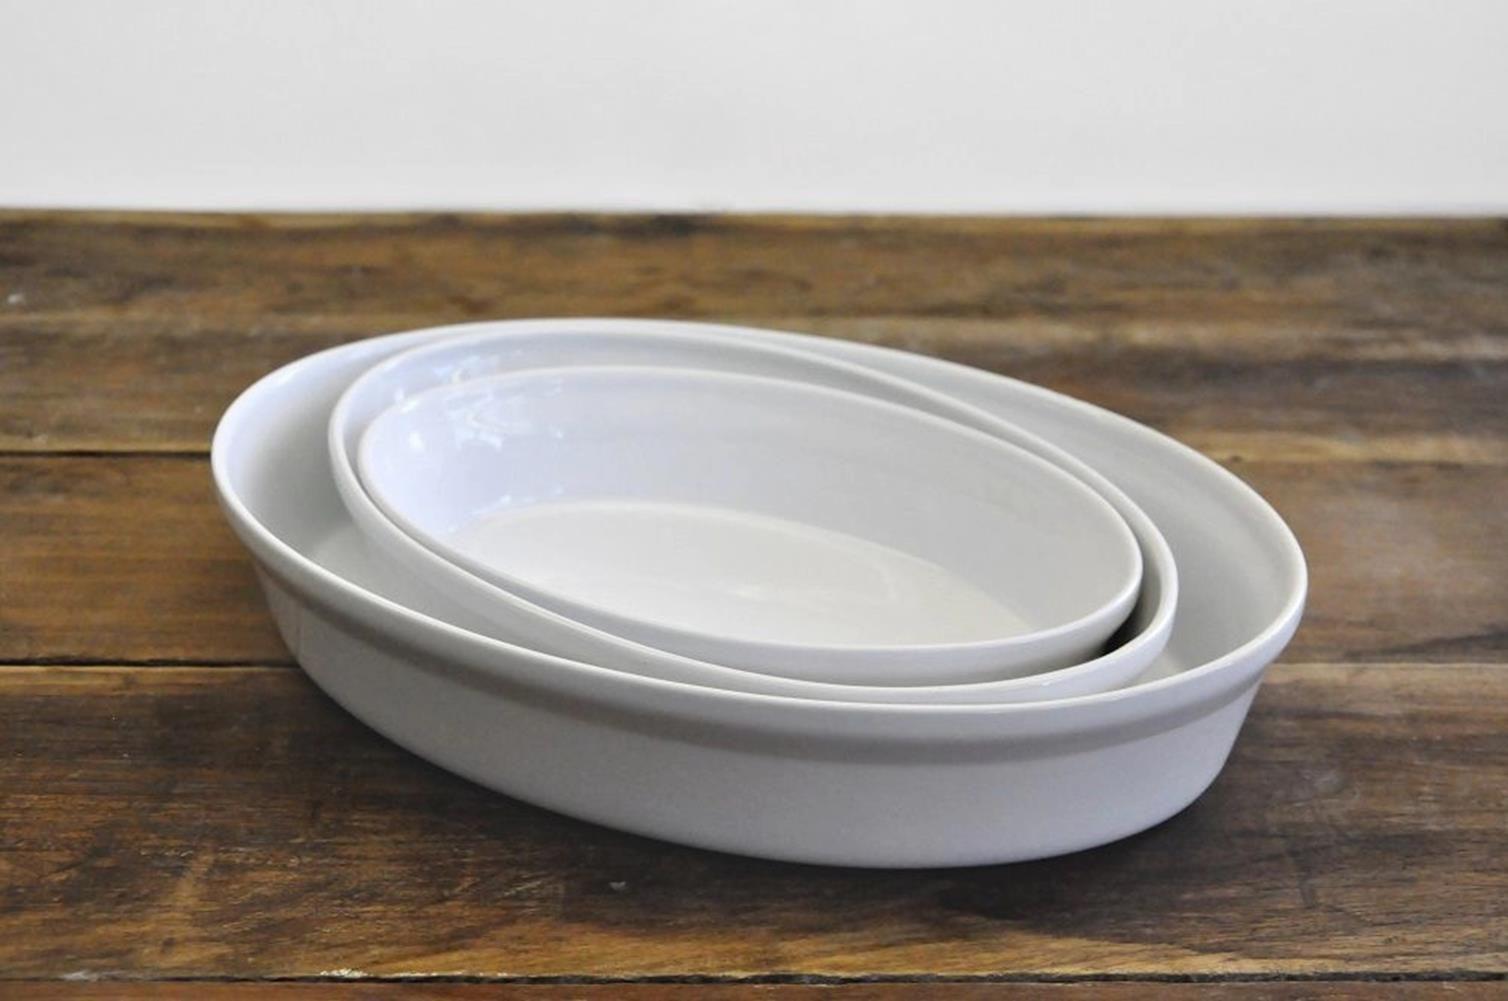 Assadeira Oval Cerâmica 33cm 2,5L Branco Mondoceram Gourmet